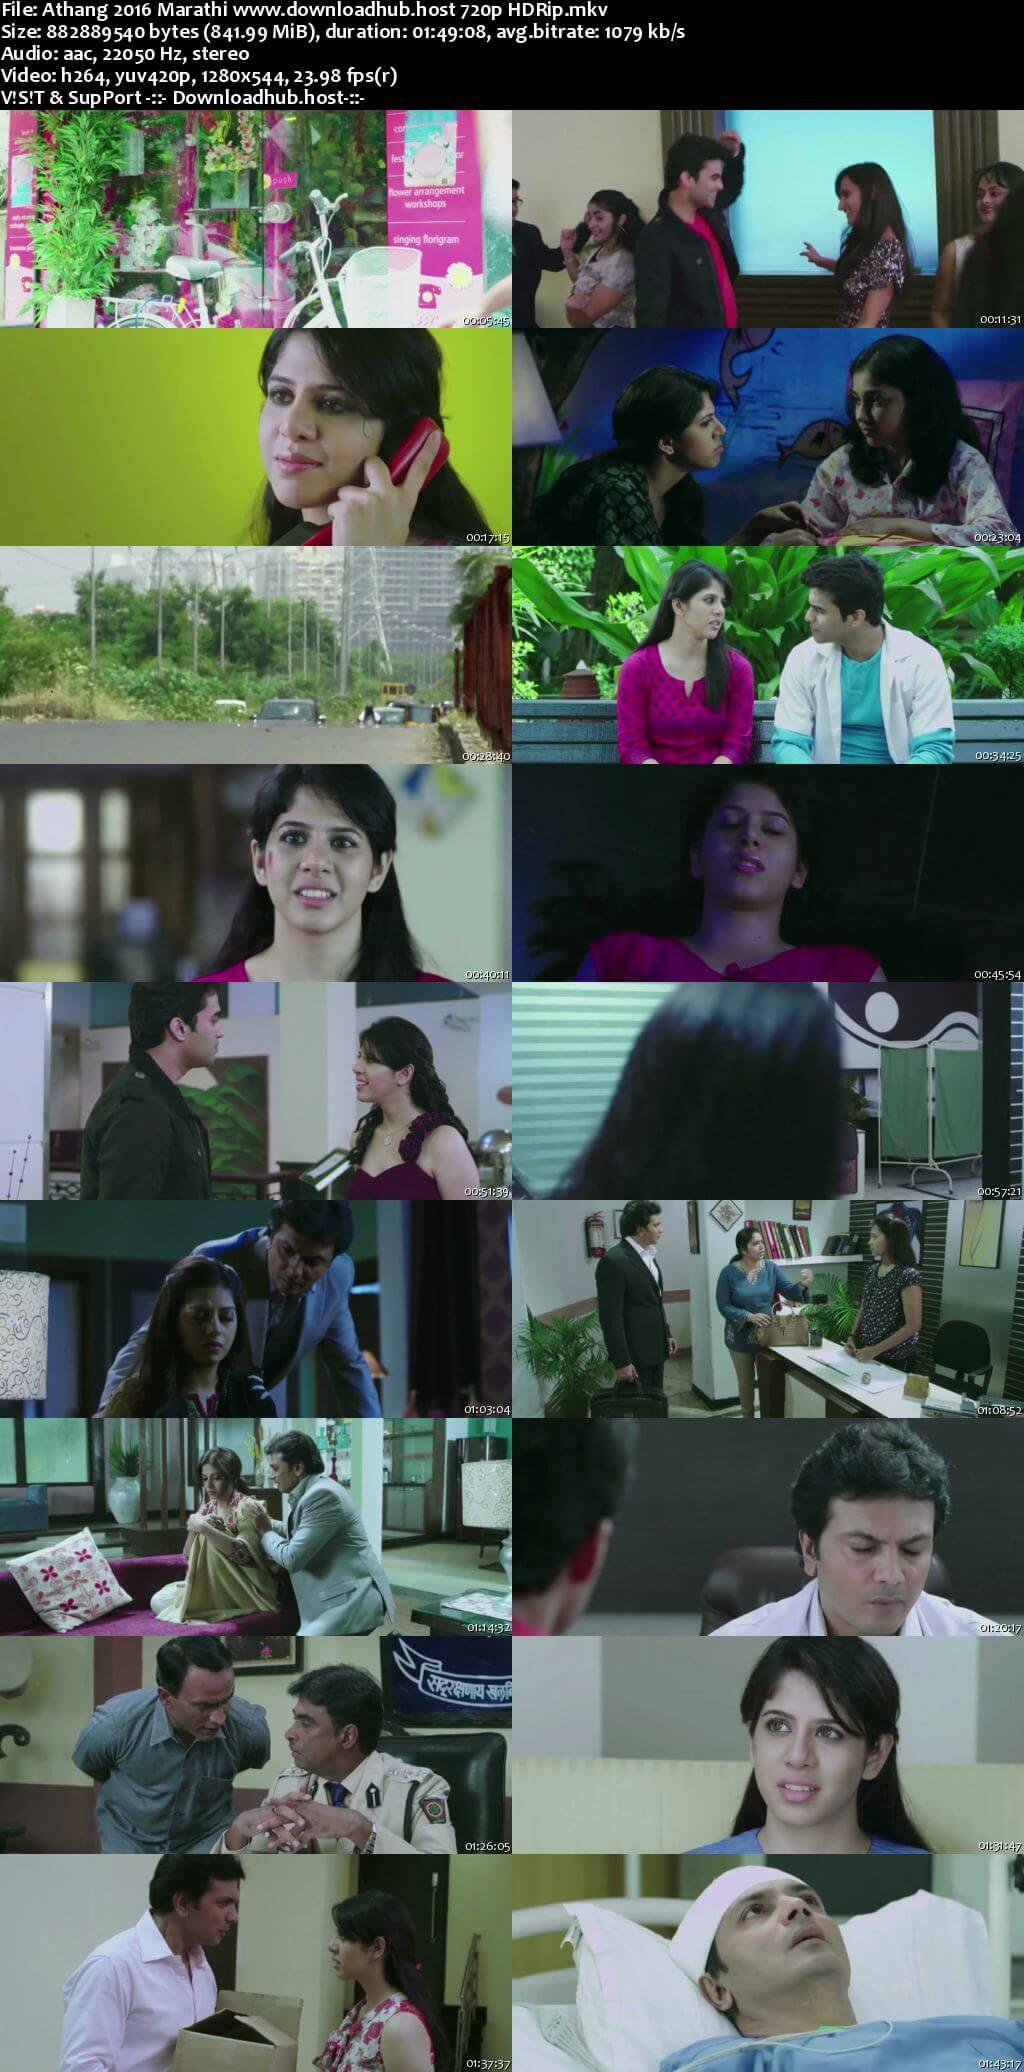 Athang 2016 Marathi 720p HDRip x264